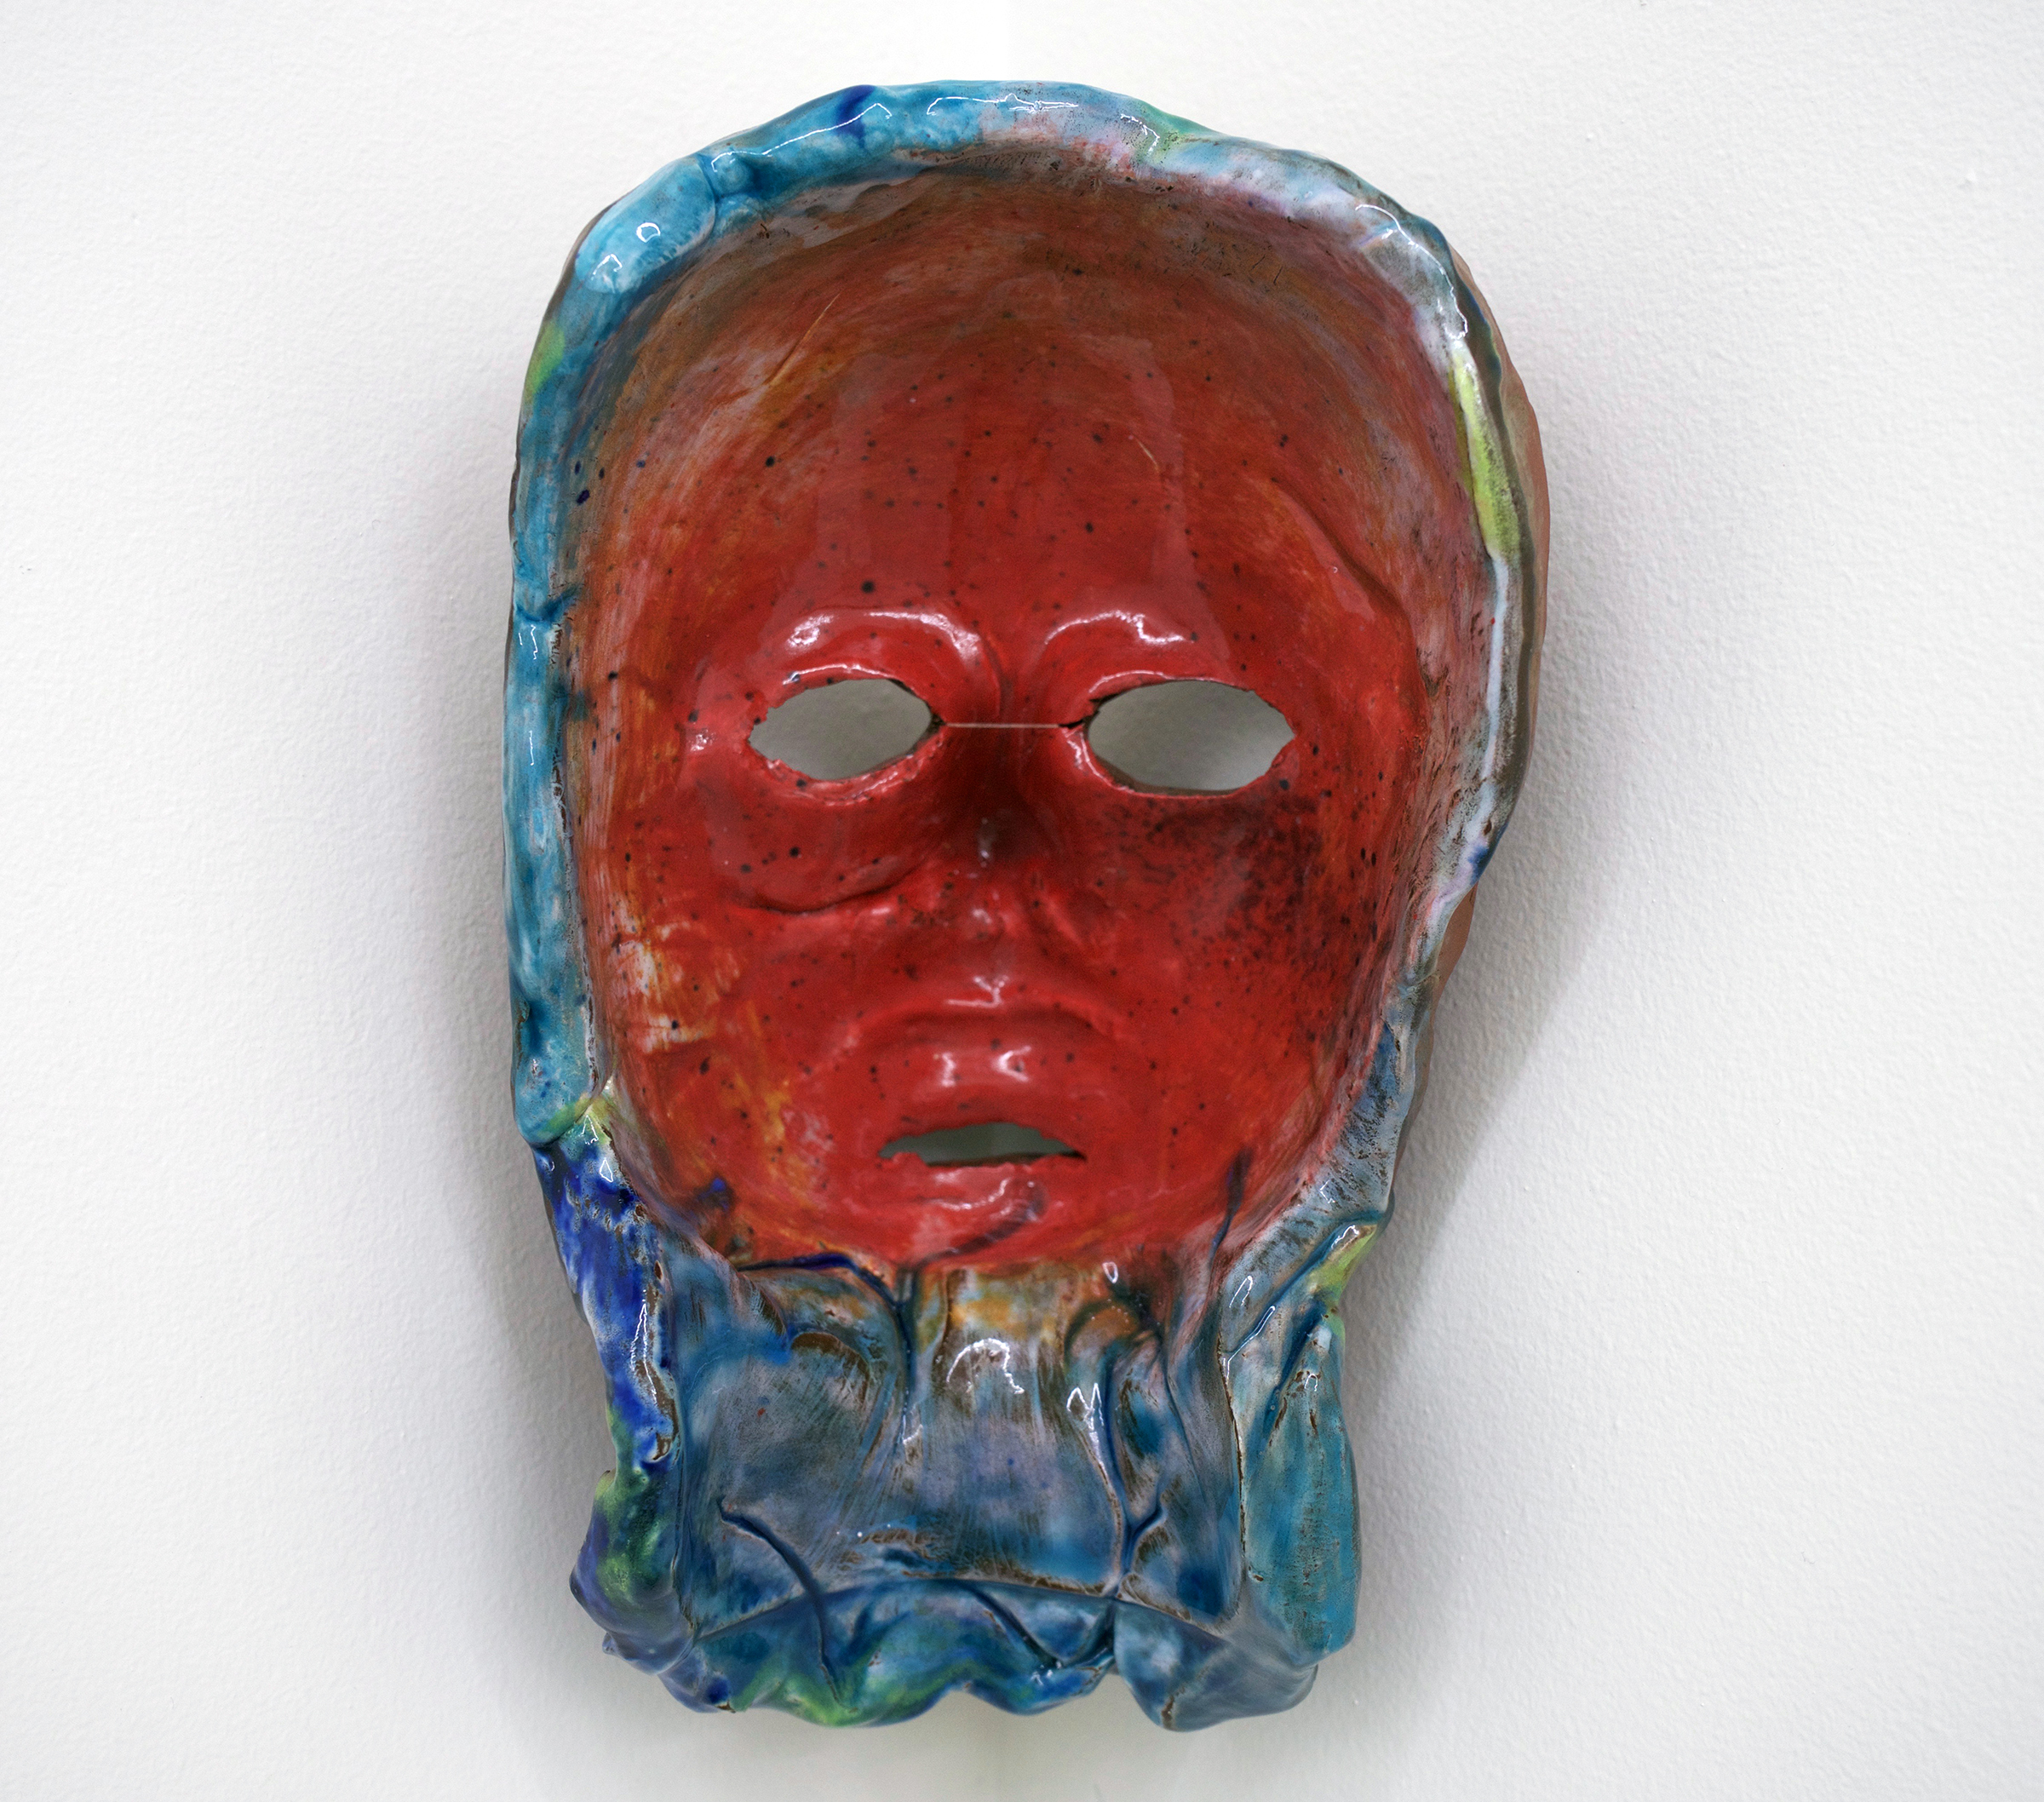 "CHRIS DUNCAN   Mask #1 , 2017, ceramic and glaze, 9 1/4"" x 6"" x 6"""